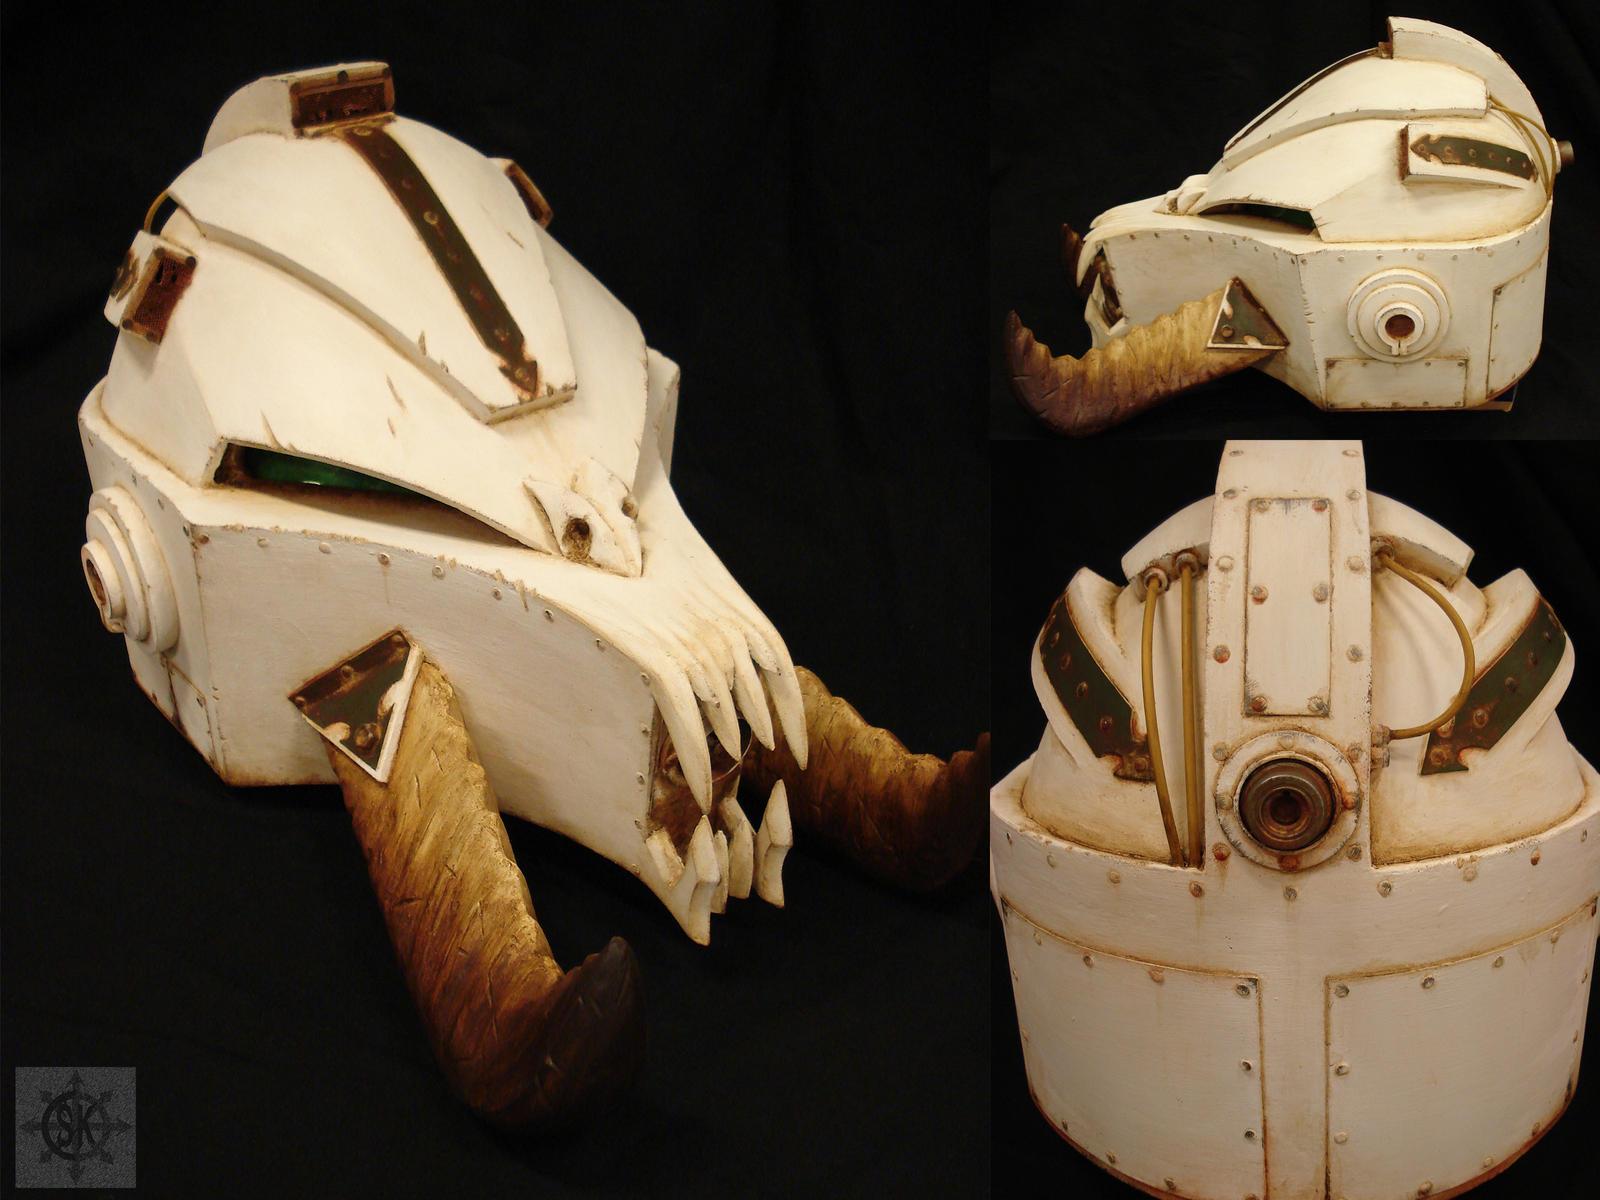 Terminator helmet by SK-OC